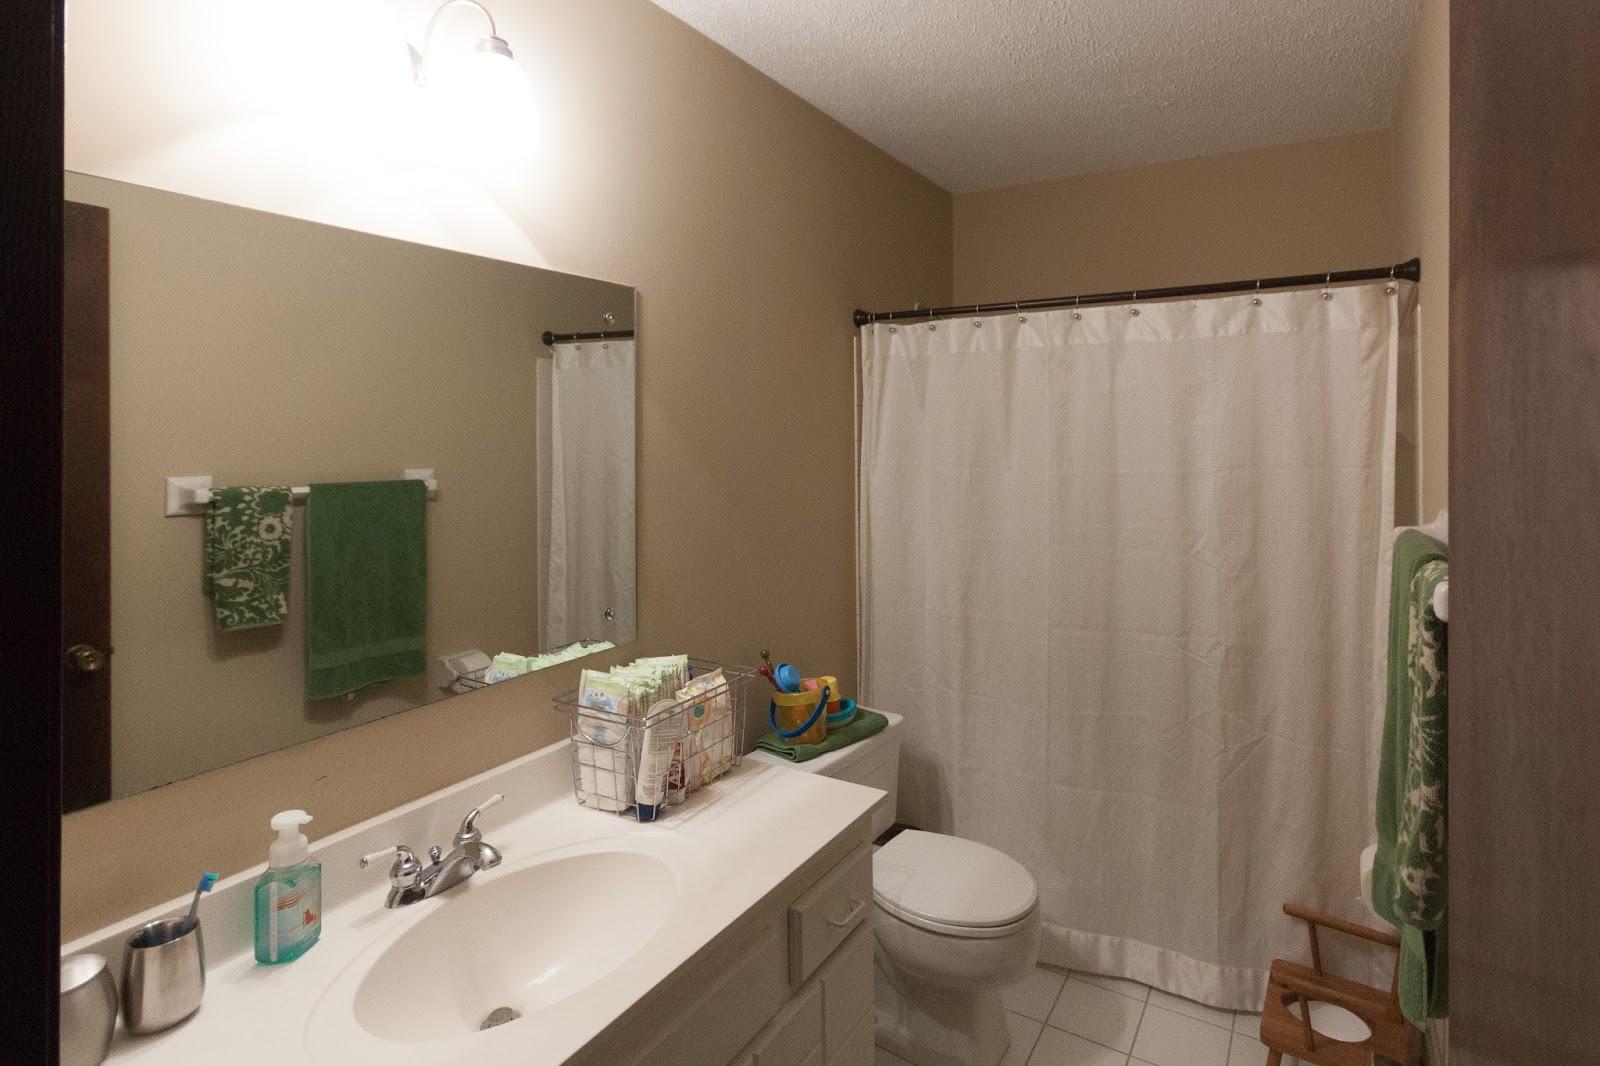 Russet Street Reno: Our Bathroom